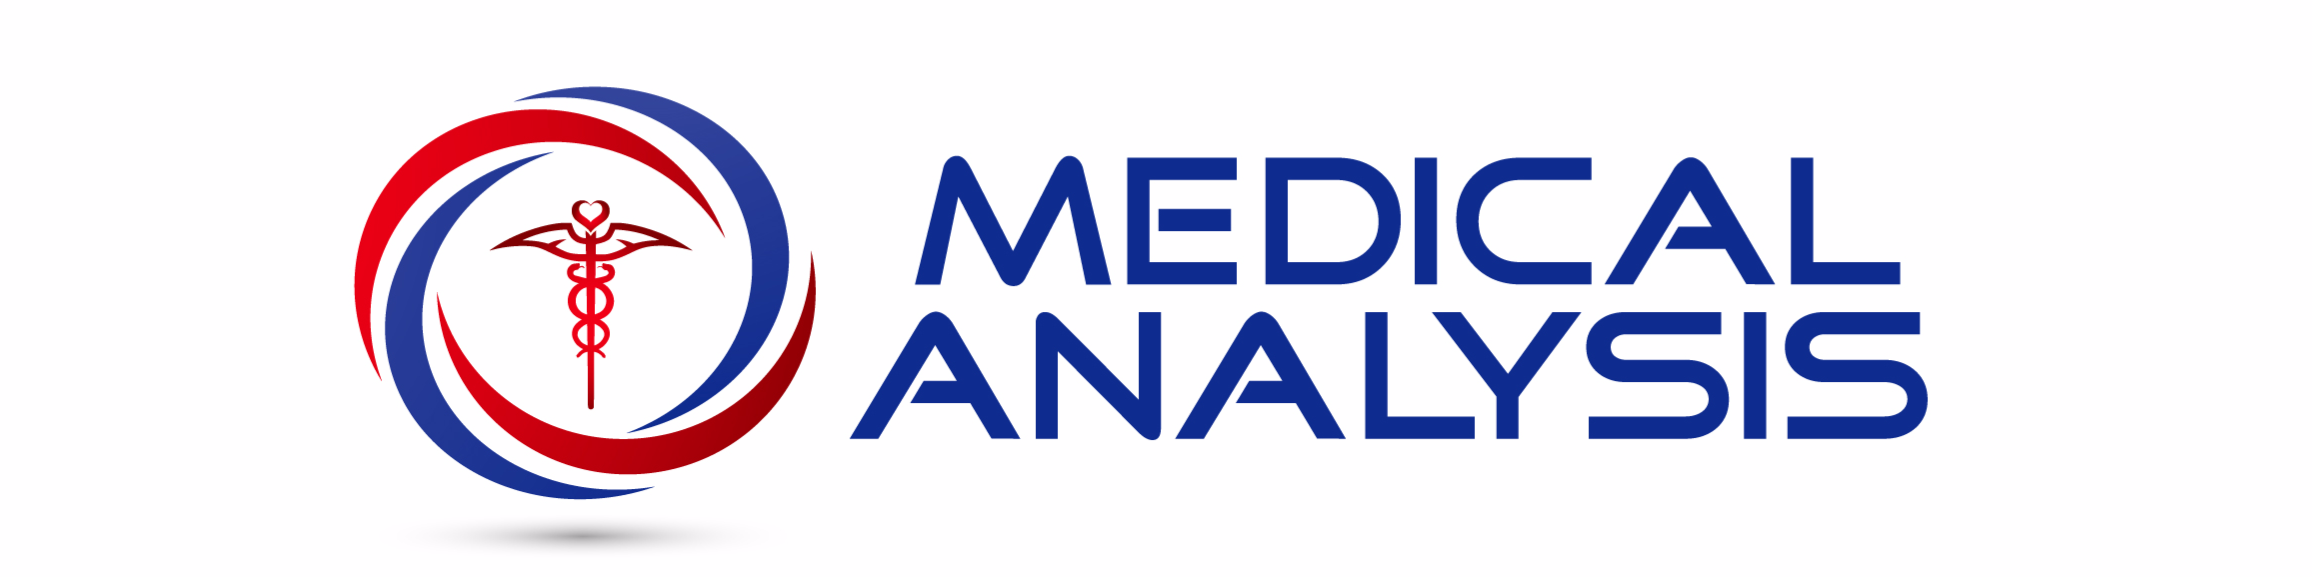 Medical Analysis Downtown Gulfport Family Medicine Biloxi Ms